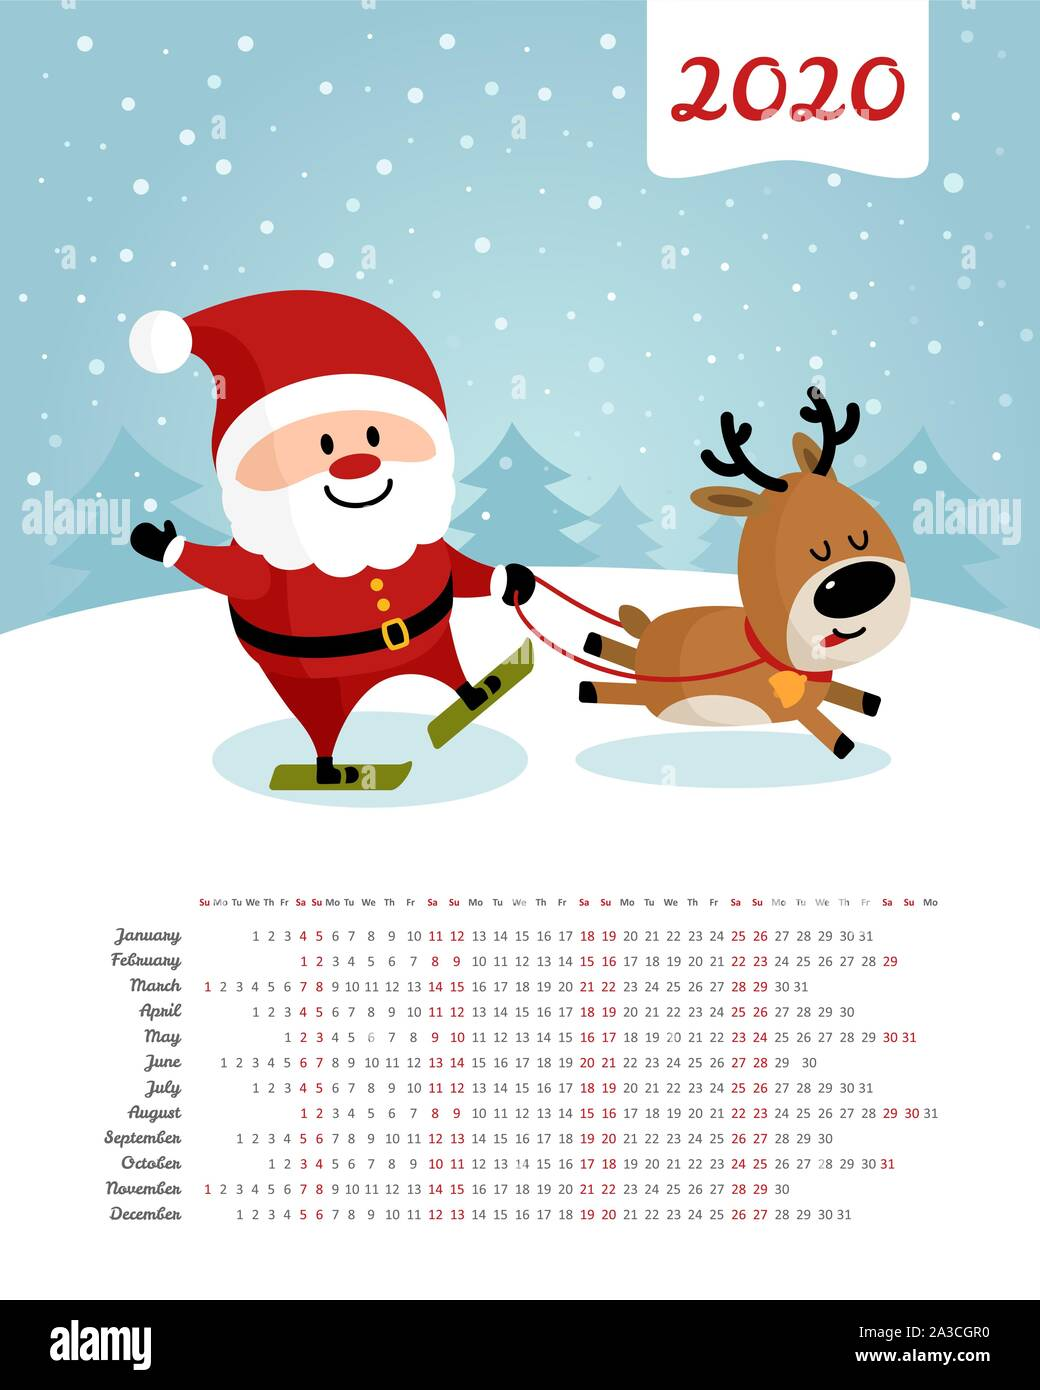 Christmas Santa Claus In July Sales 2020 Calendar 2020 year. Santa Claus and deer skiing. Merry Christmas